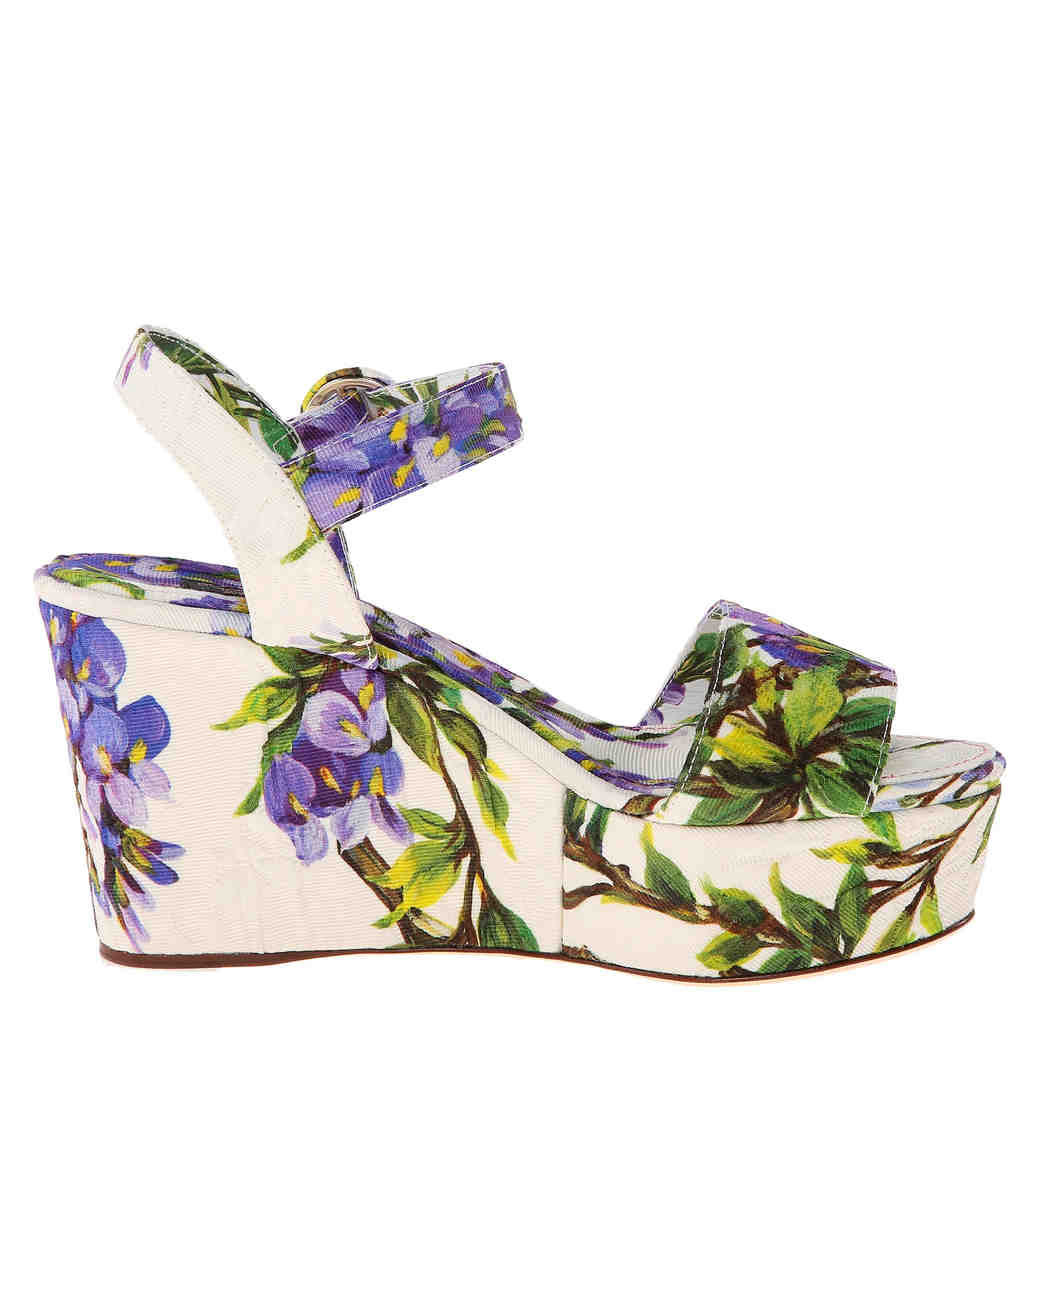 summer-wedding-shoes-dolce-gabbana-wisteria-wedges-0515.jpg